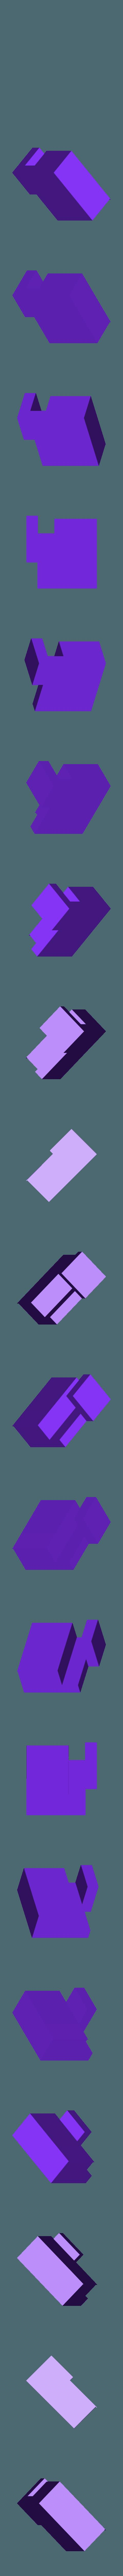 gear-rail-boxB.stl Download free STL file Mechnolia • 3D printing template, ChrisBobo